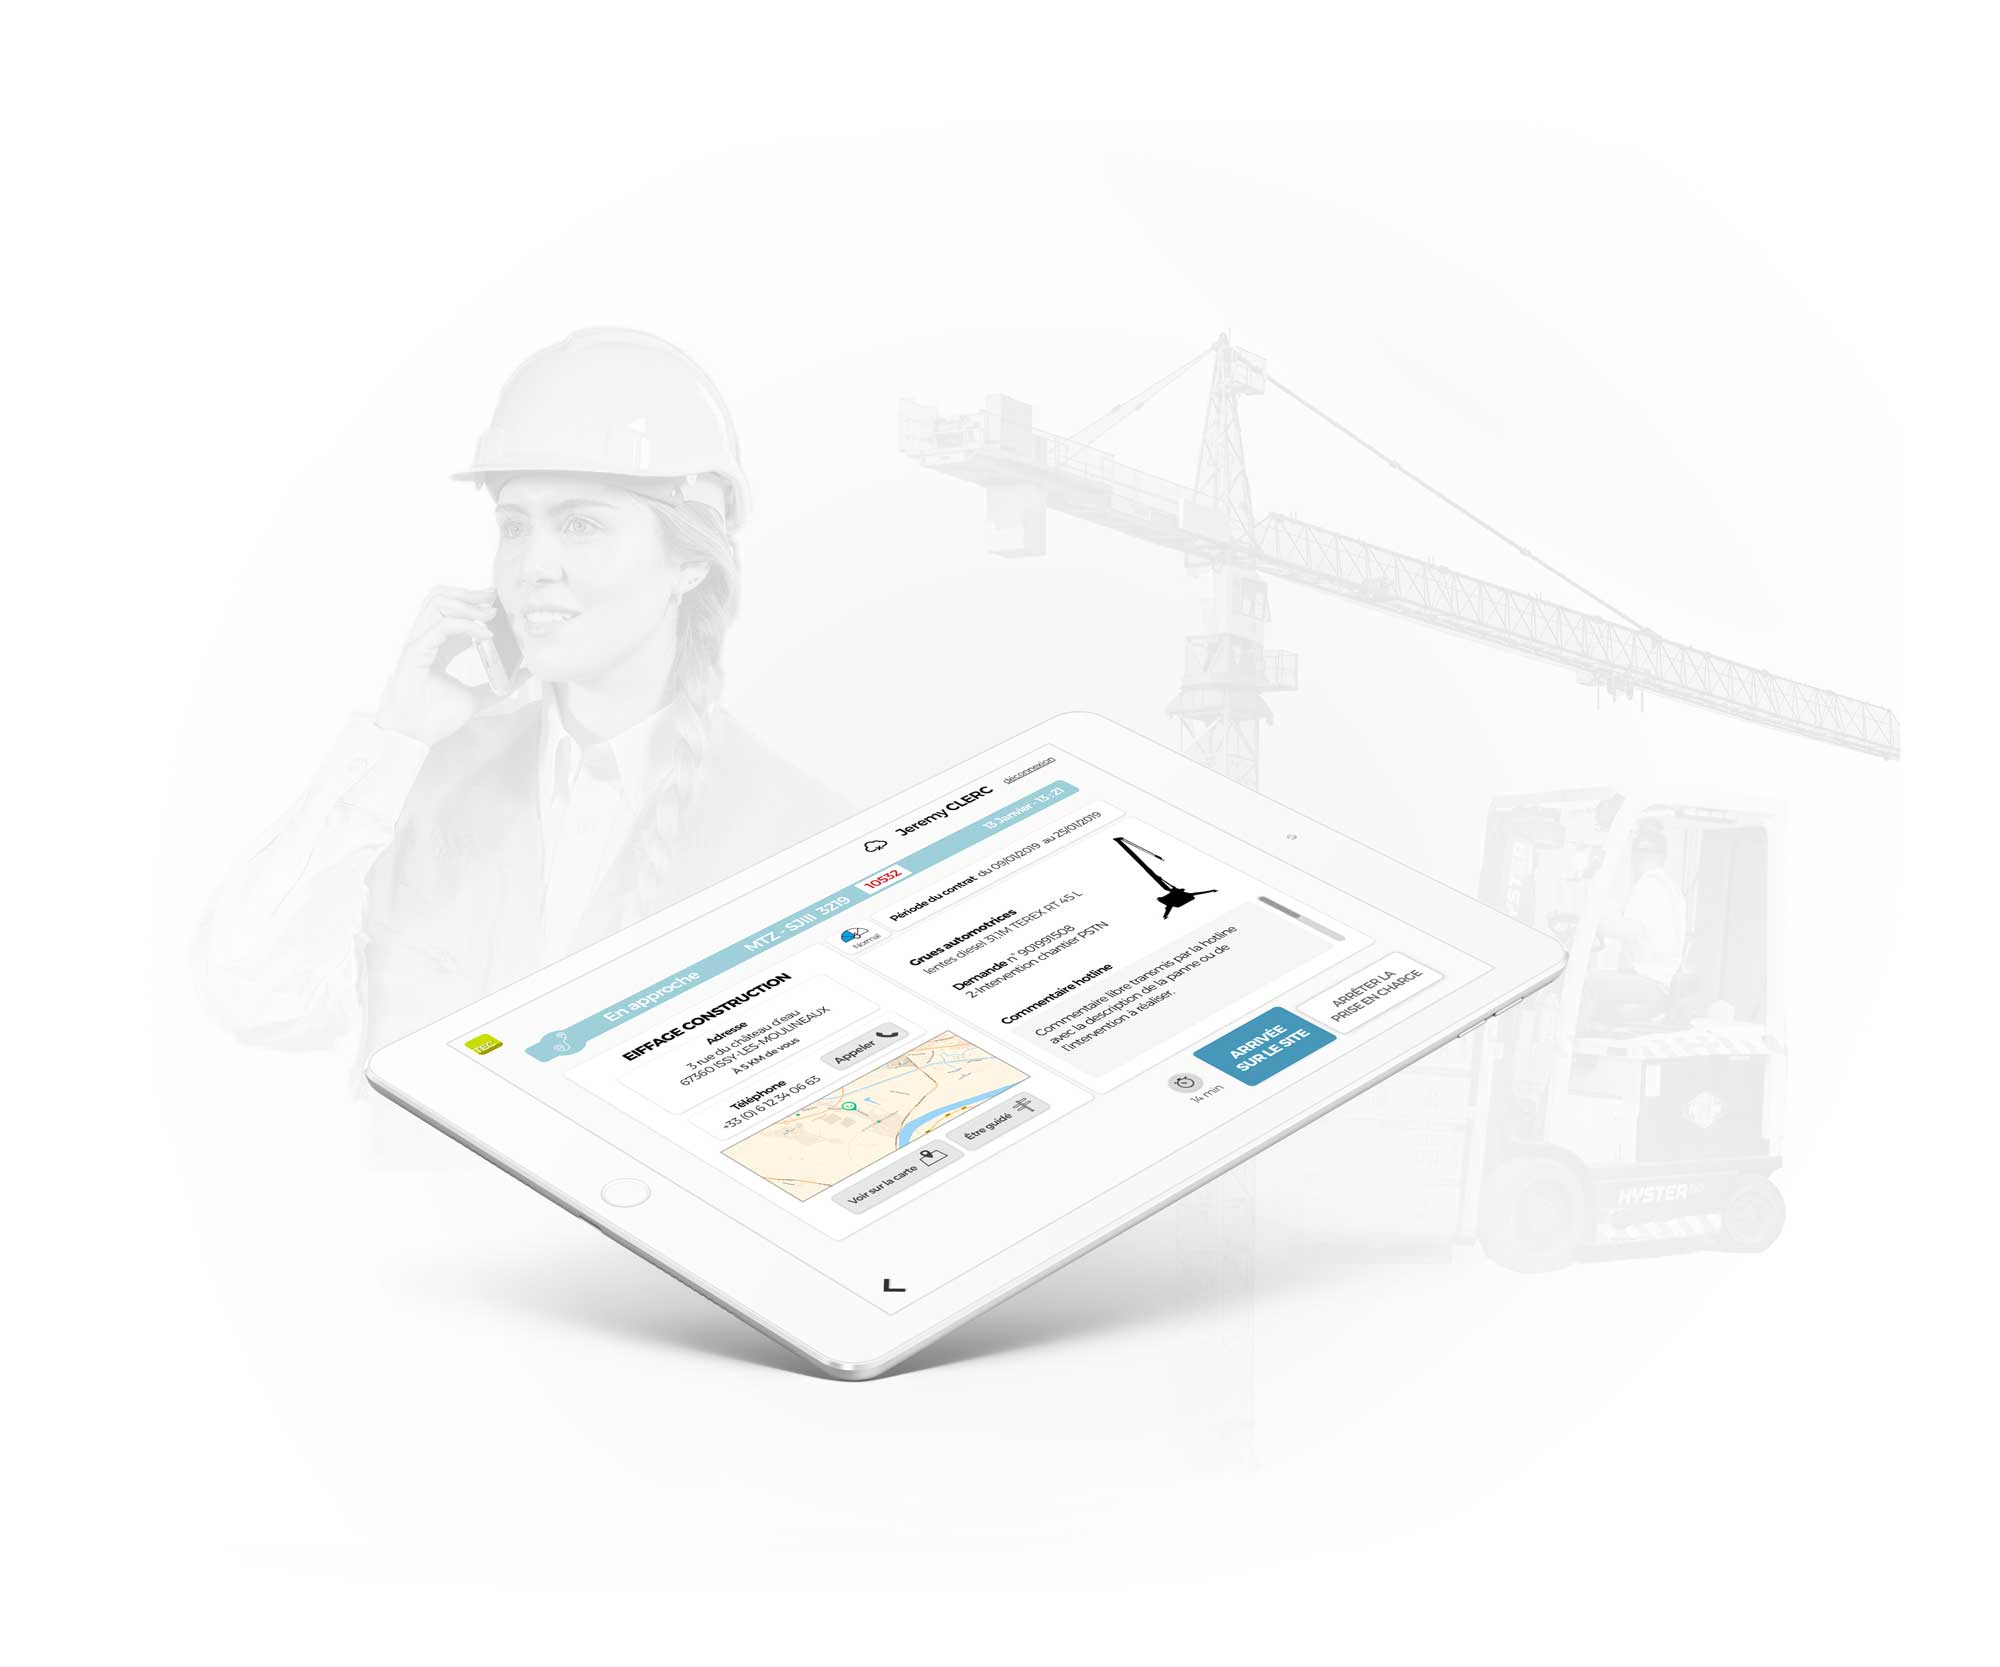 InfleXsys Relation client digitale forbiiz Tech tablette technicien